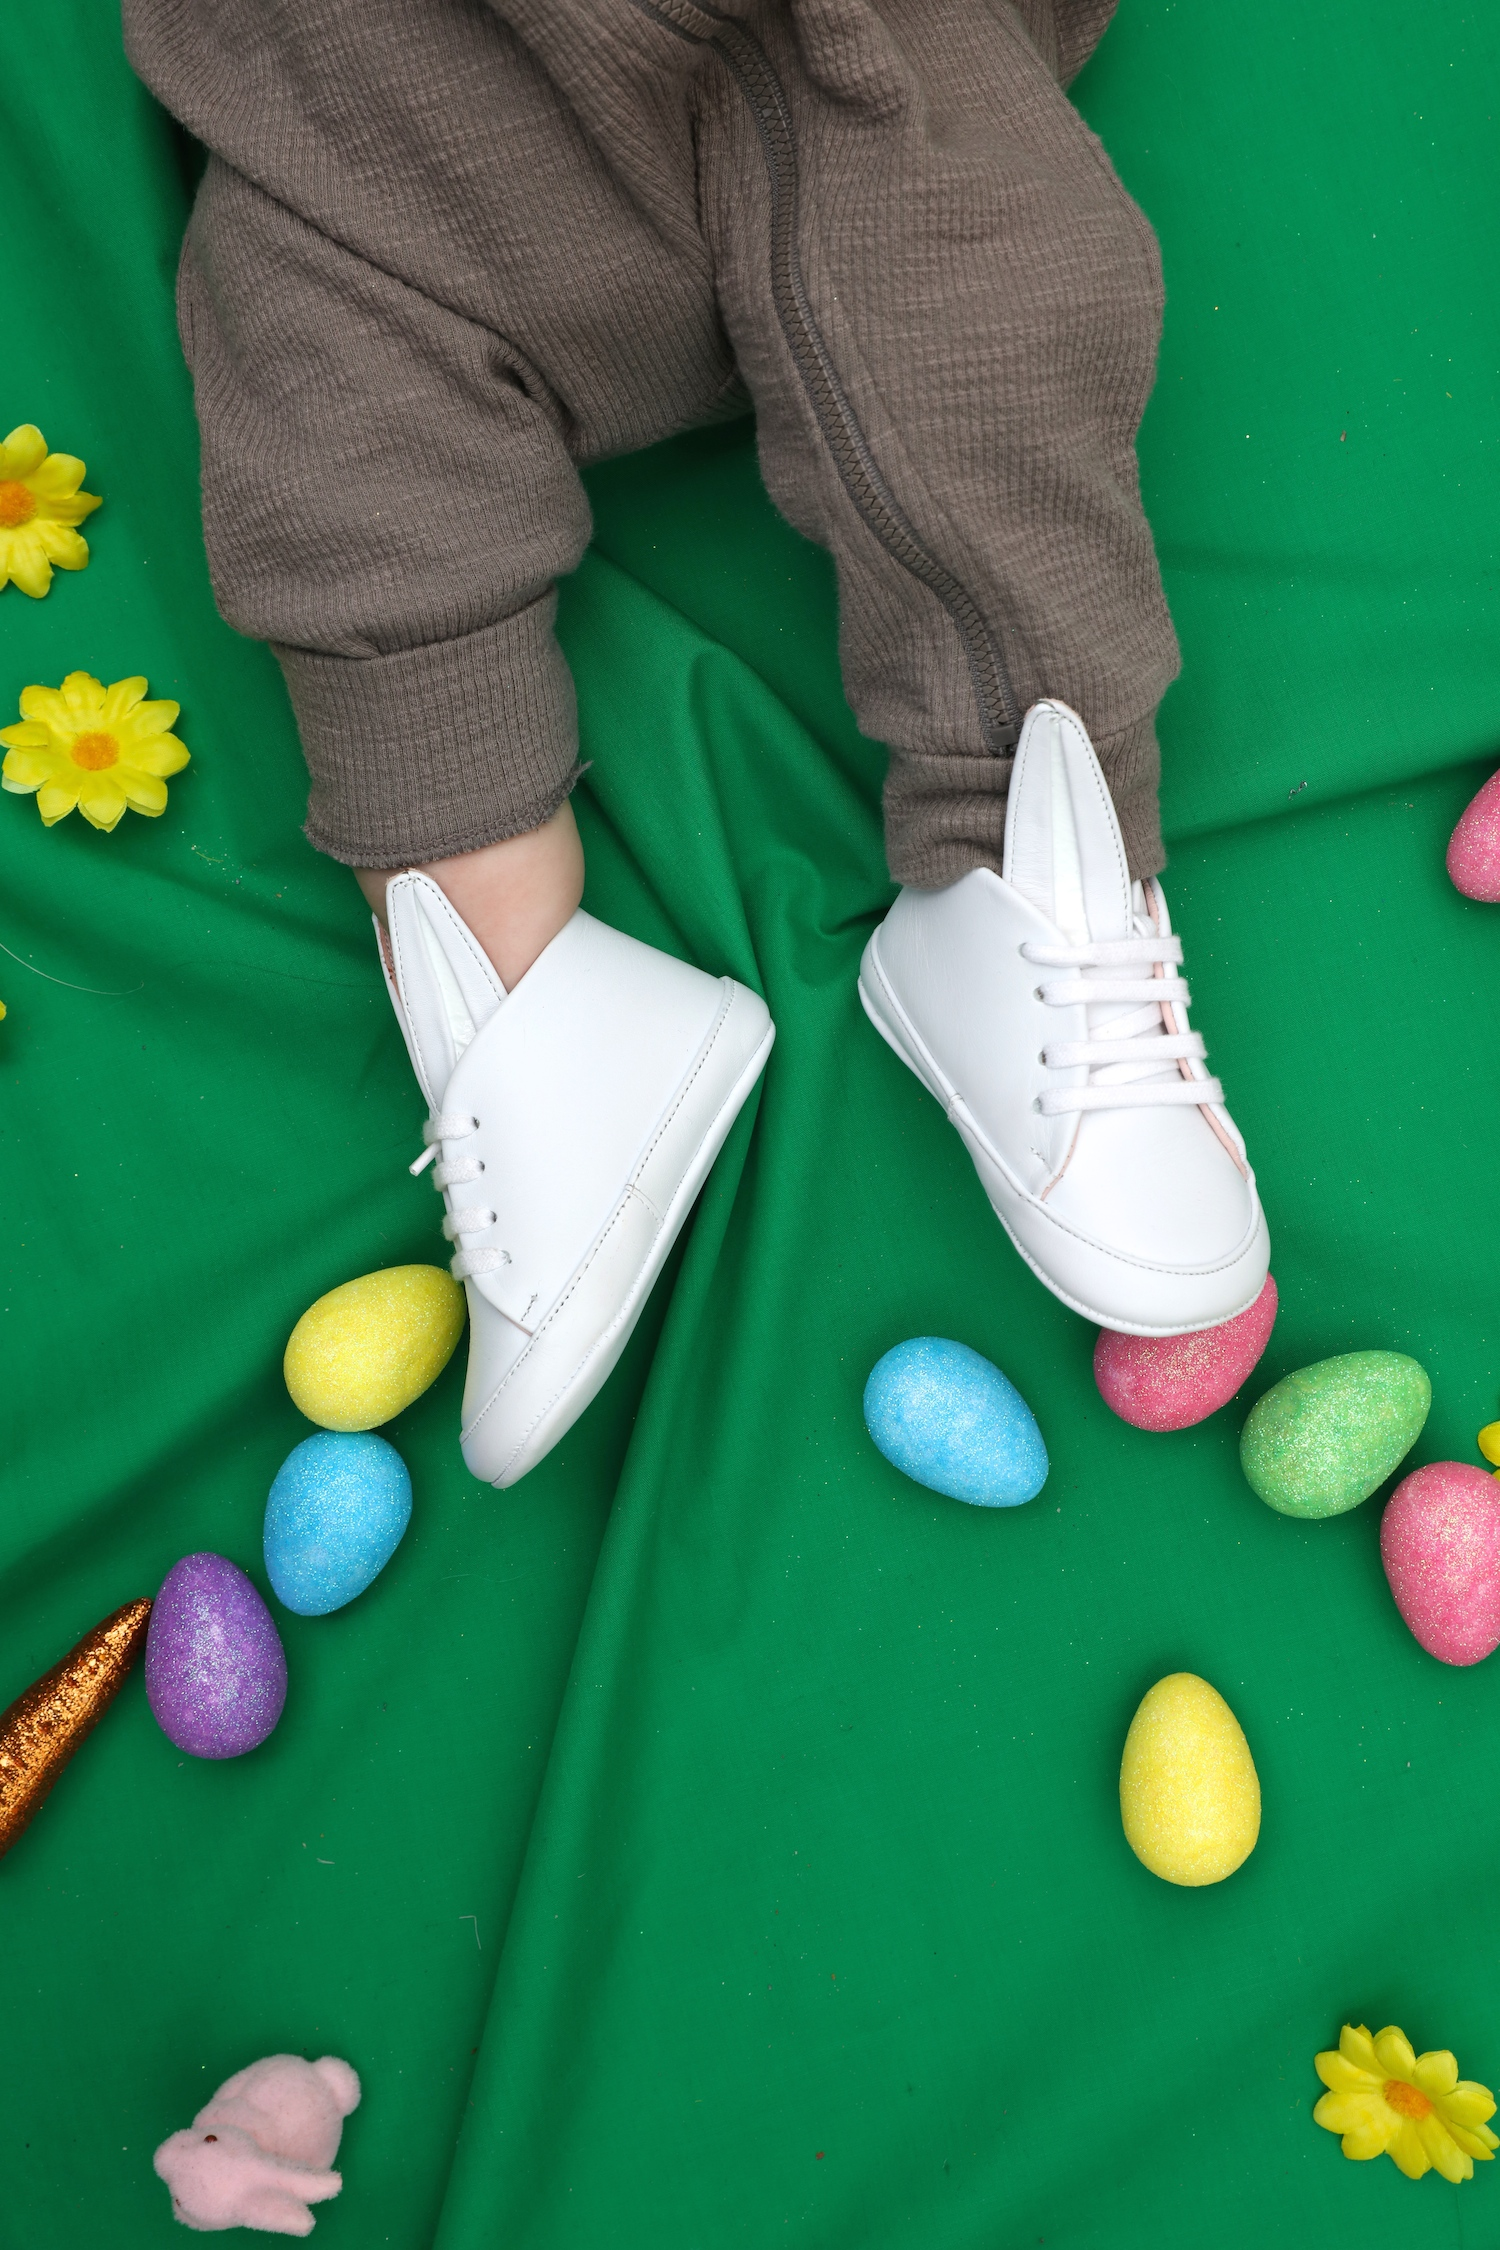 minna_parikka_baby_bunny_trainers_shoes